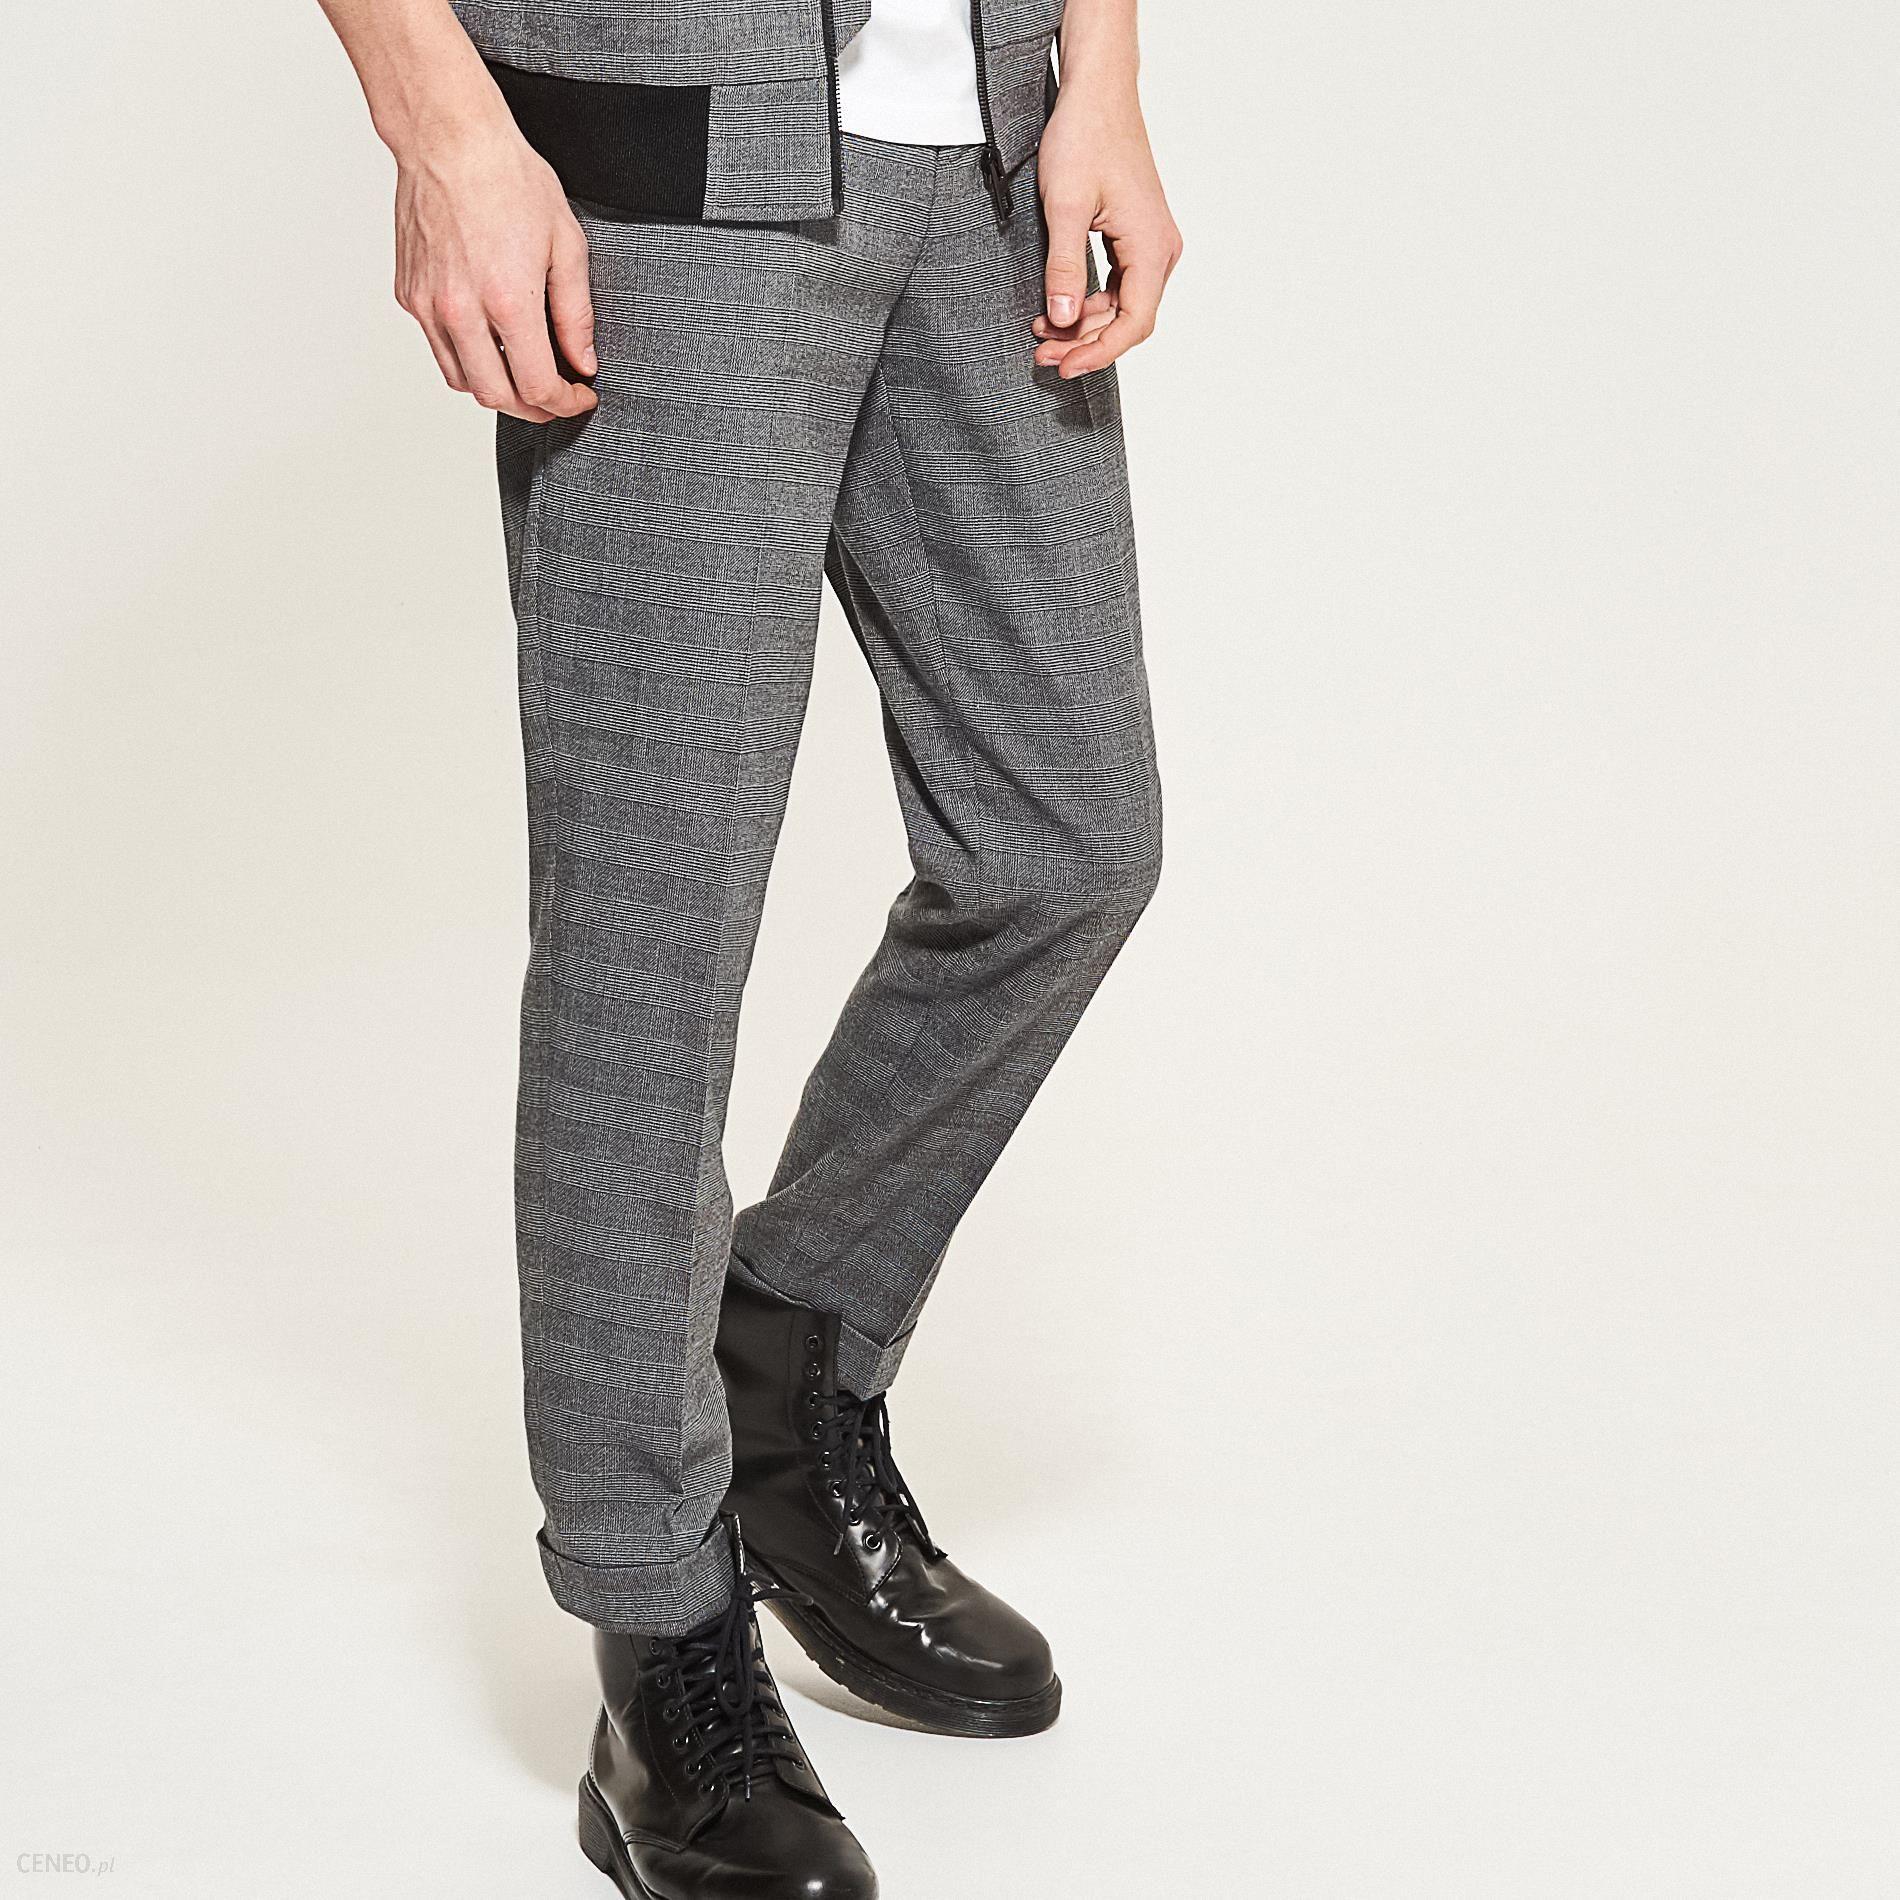 558a155a63 Reserved - Eleganckie spodnie w kratę - Szary - damski - Ceny i ...